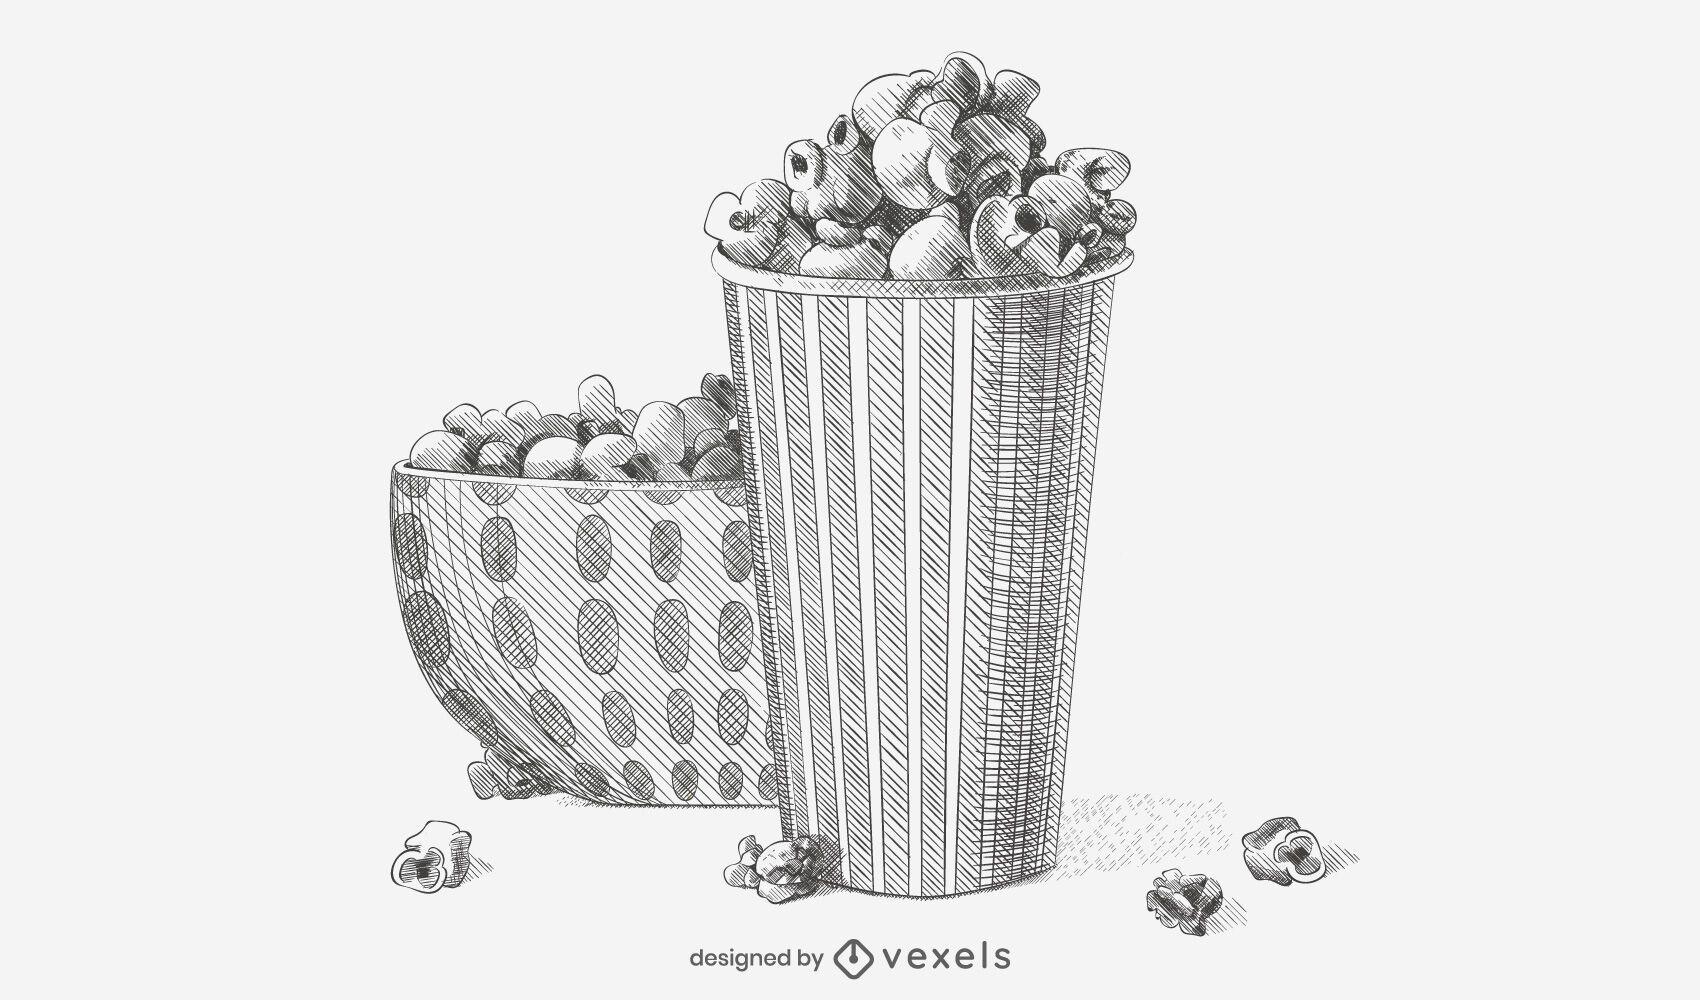 Hand-drawn Popcorn Sketch Illustration